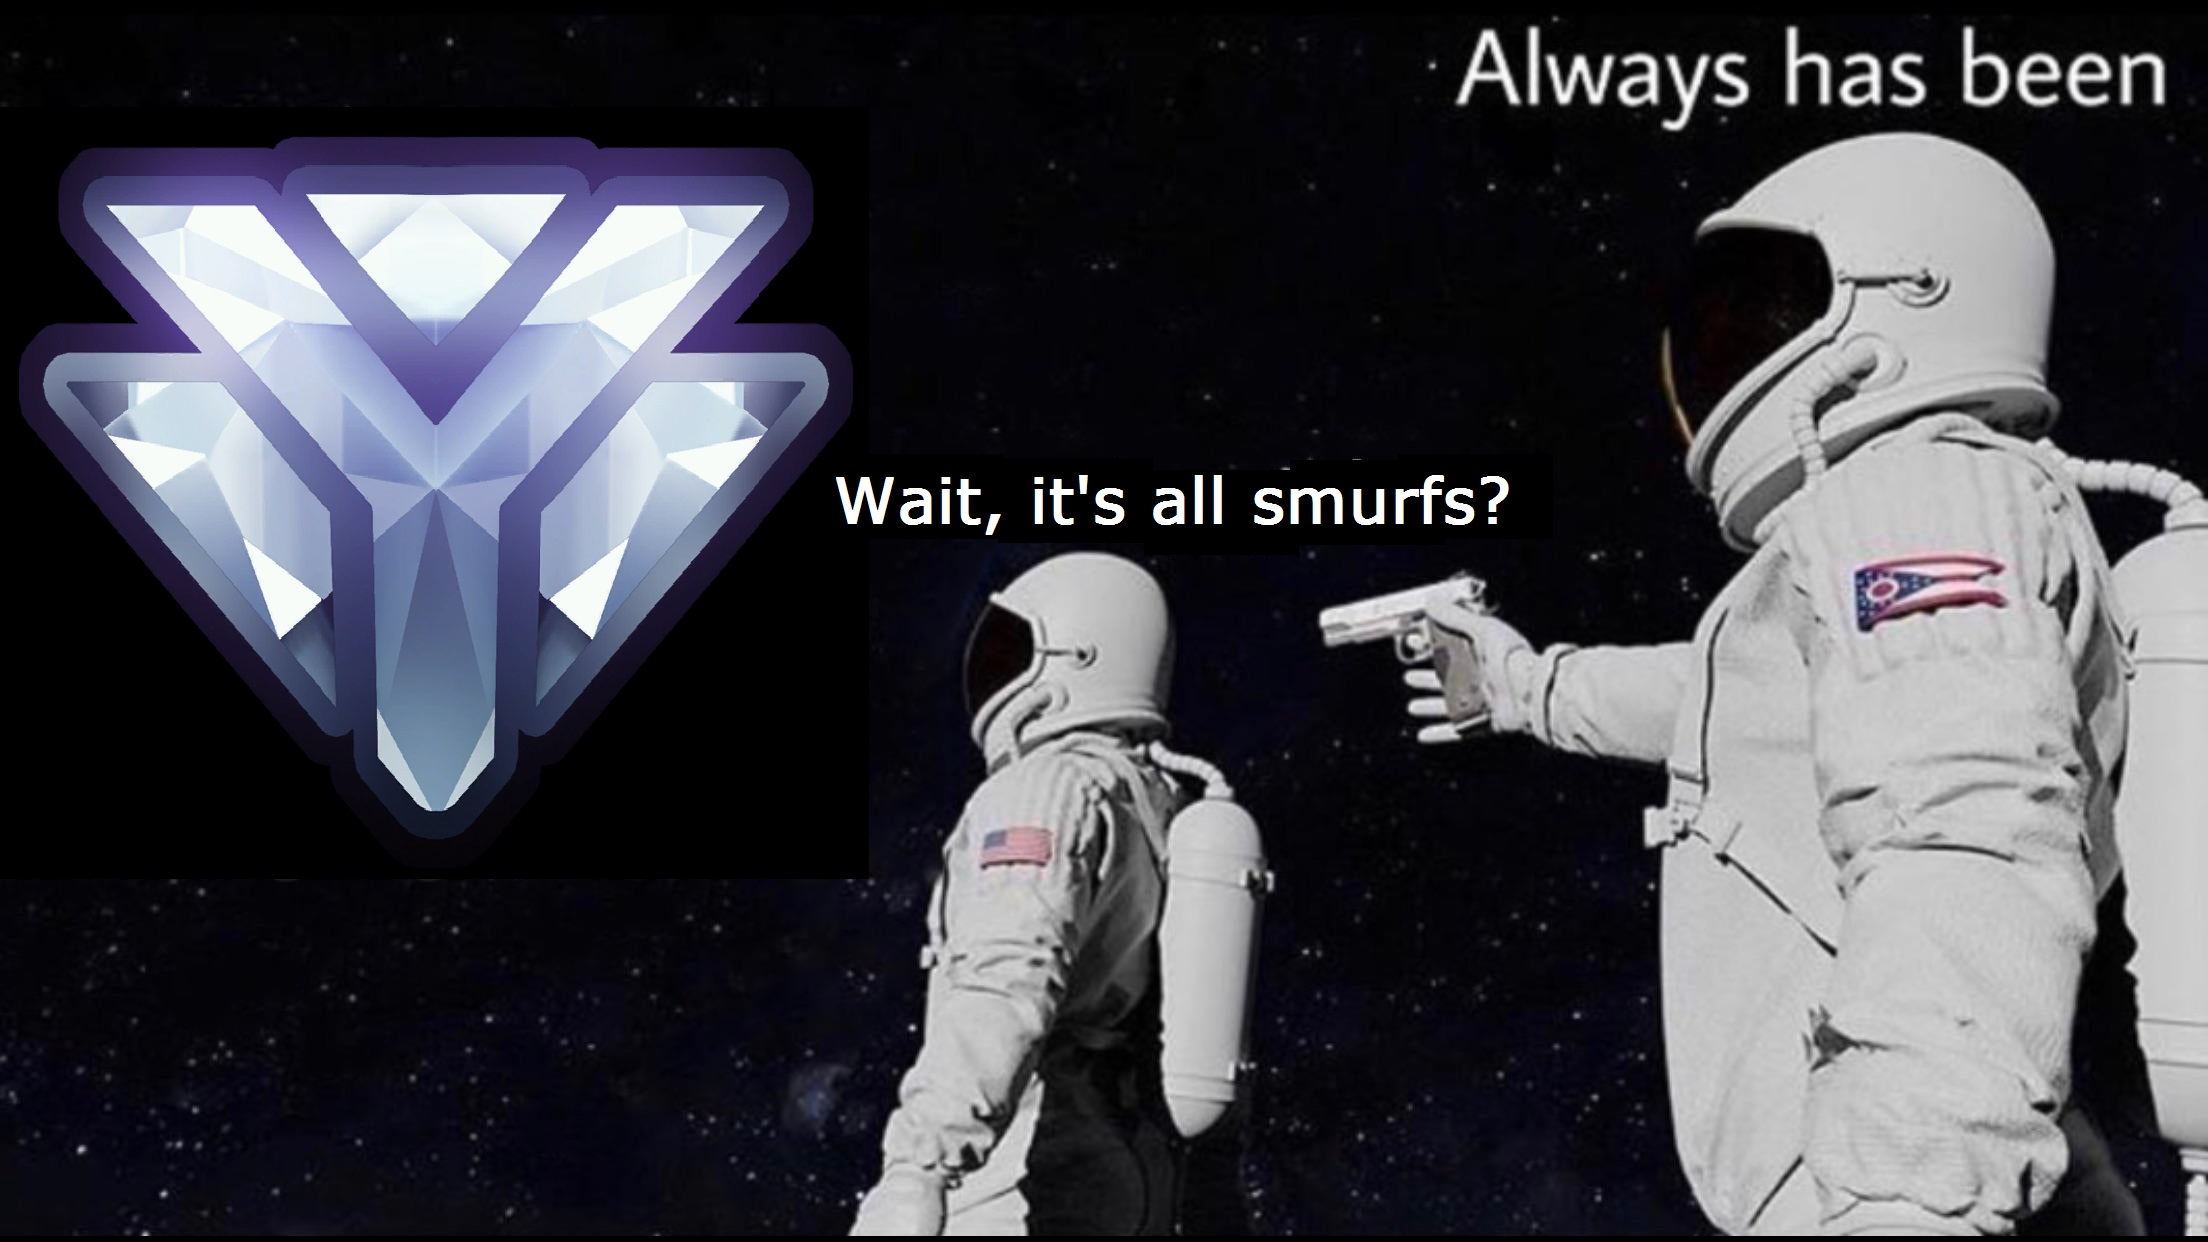 its all smurfs meme, its all smurfs astronaut meme, its all smurfs astronaut gun meme